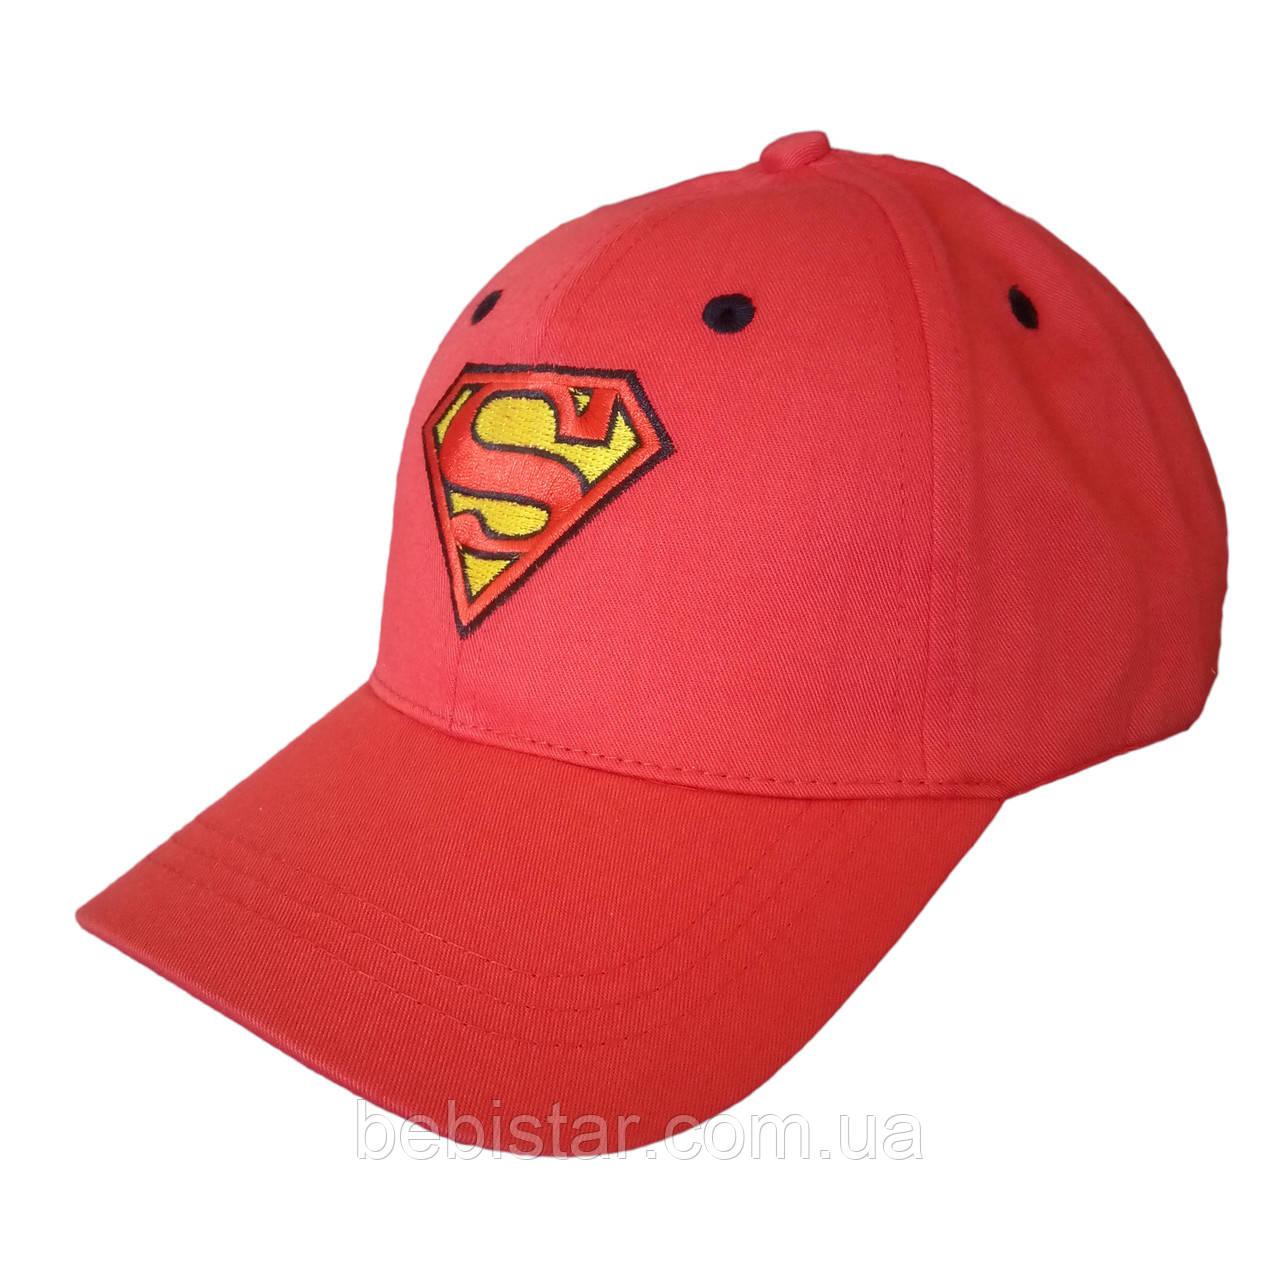 Кепка бейсболка  супермен красная для мальчика